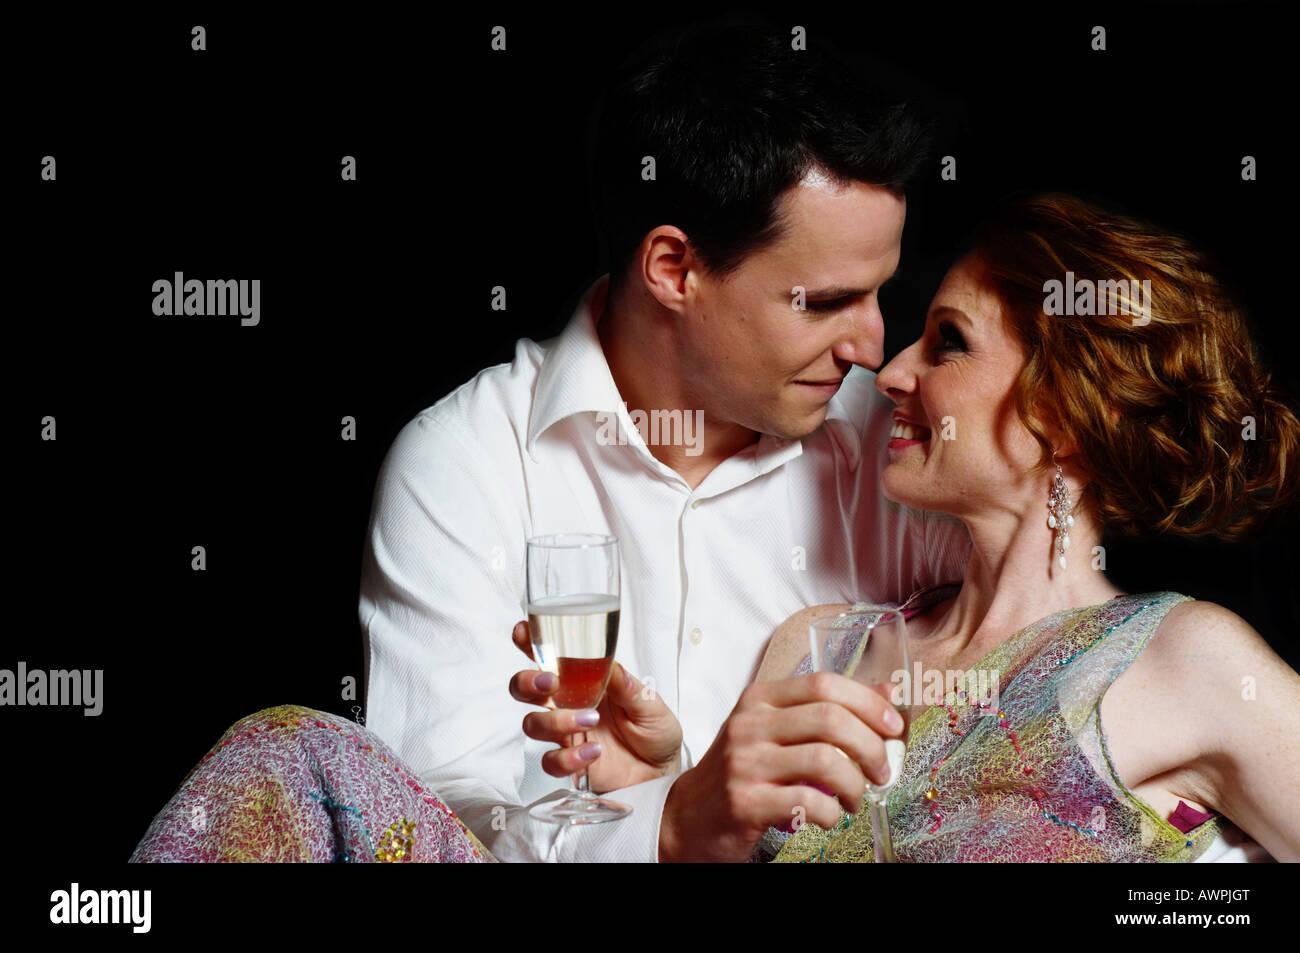 af3623a9fff0 Couple dressed in evening wear, cuddling Stock Photo: 16633319 - Alamy